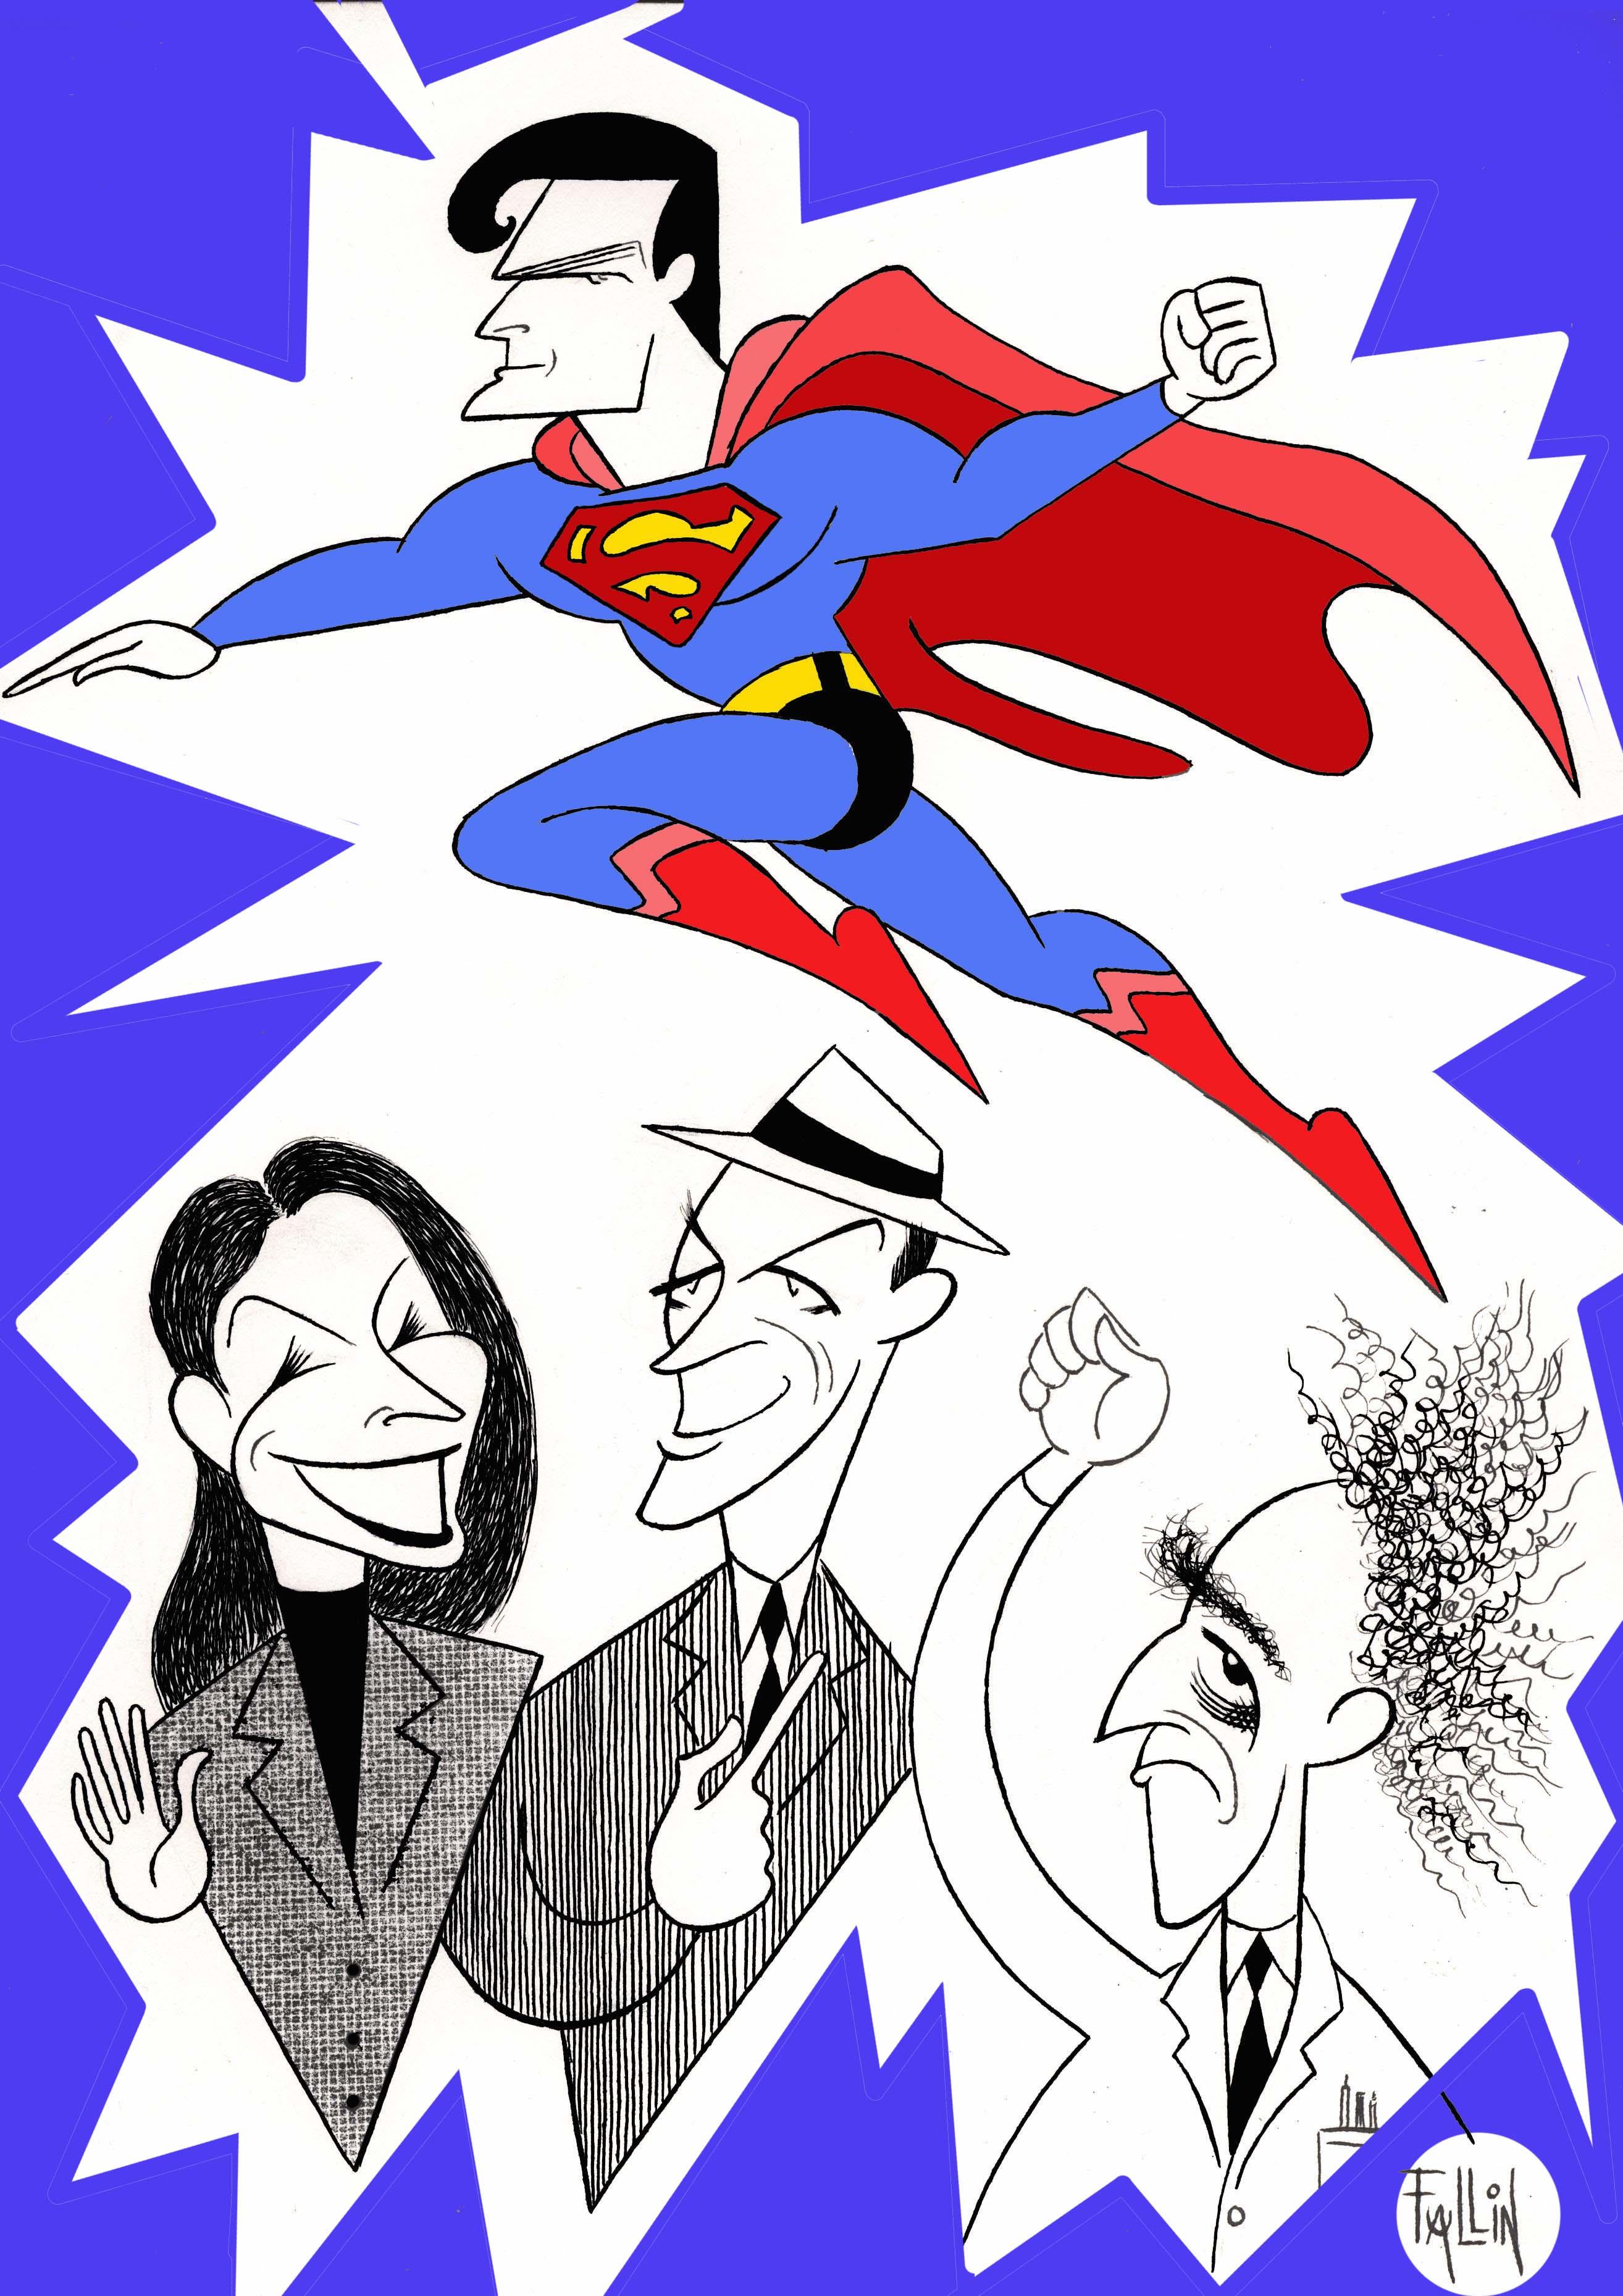 2013-03-22-SUPERMANcolorBLUE.jpg